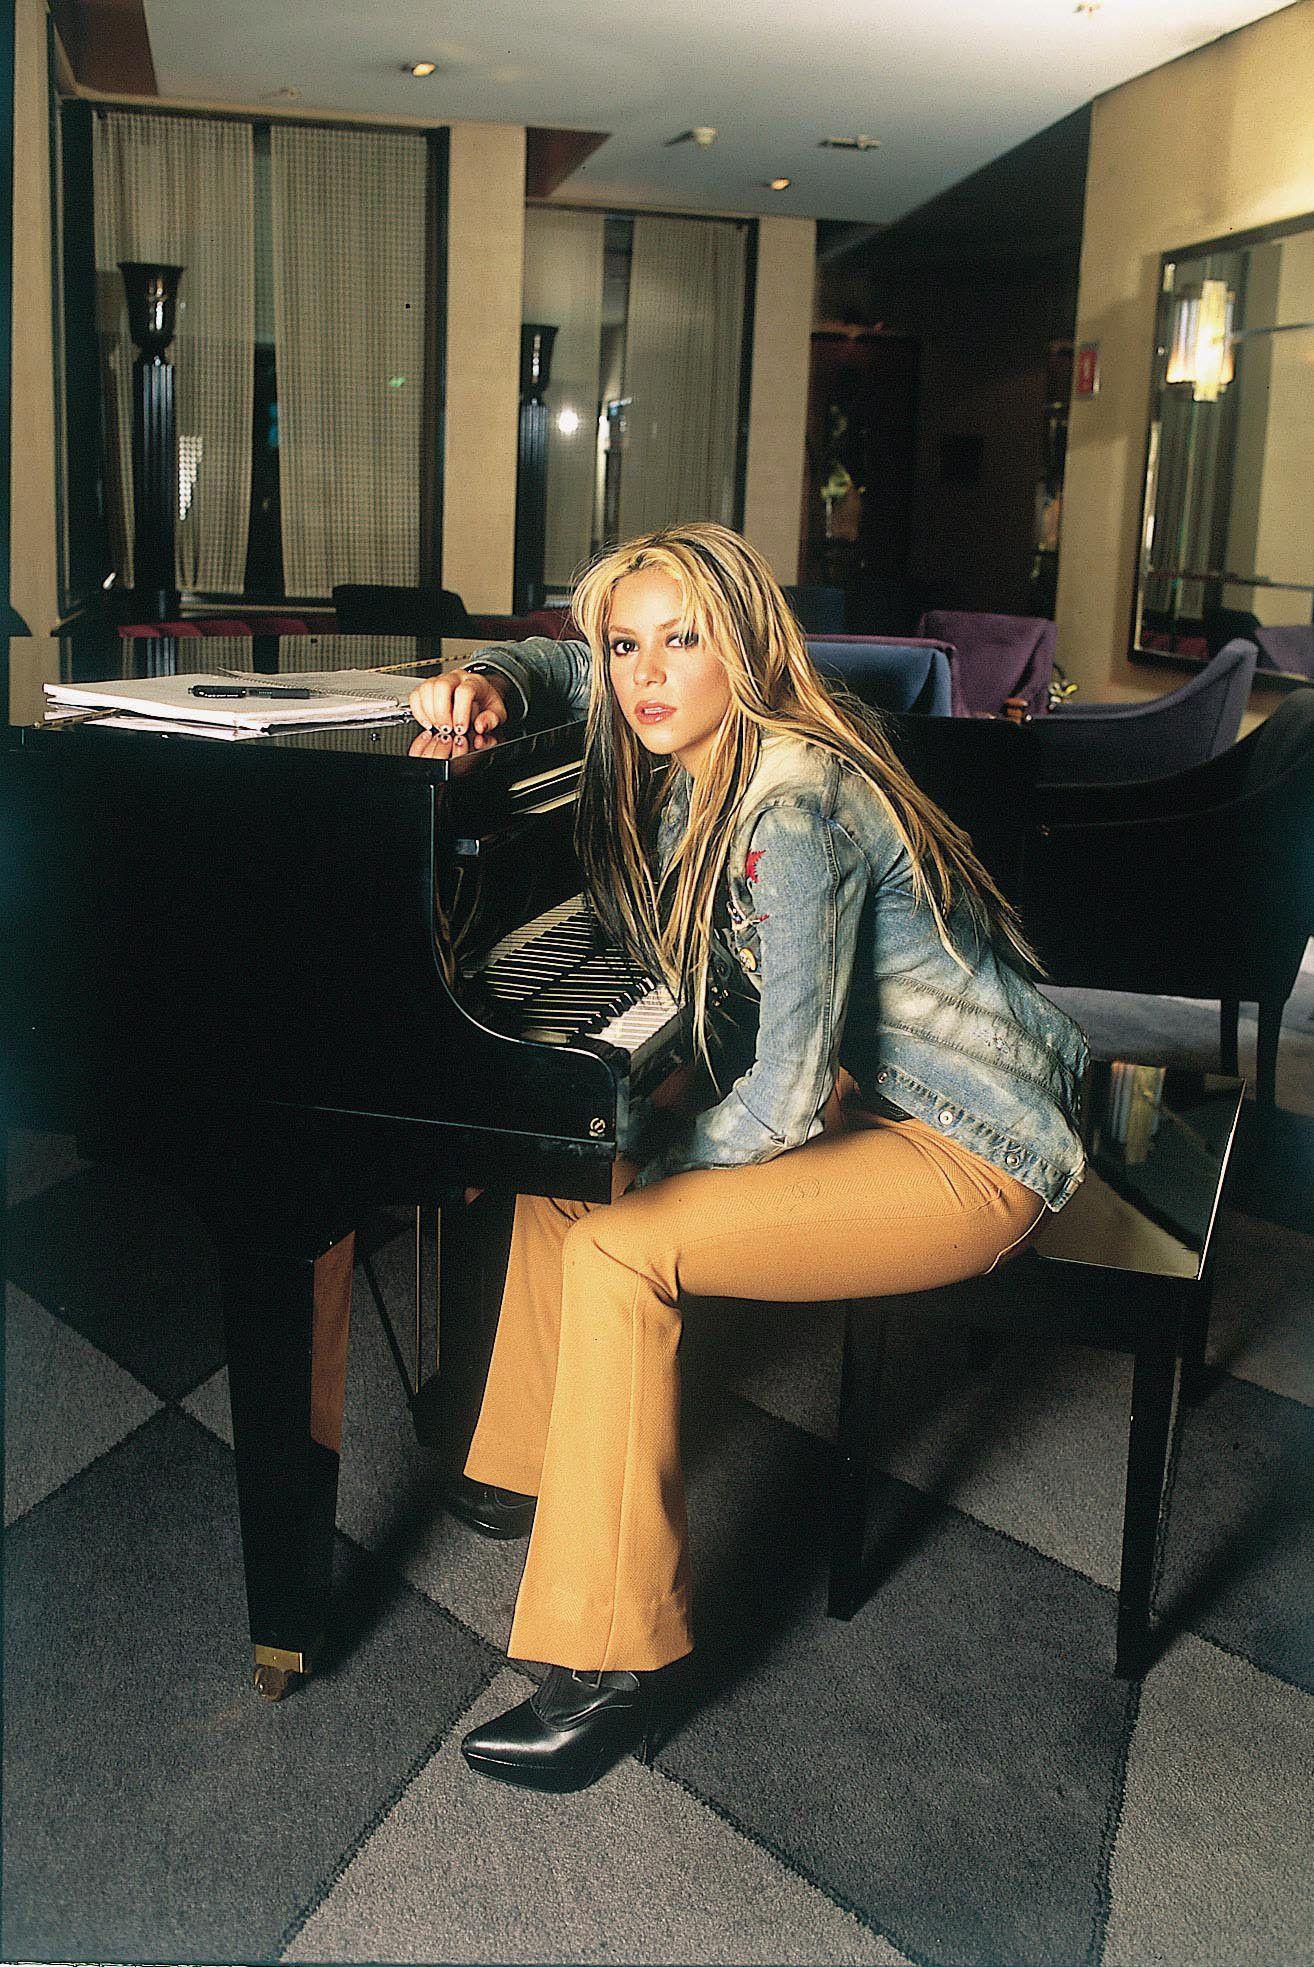 Shakira: Shakira - Unknown PhotoShoot |Shakira Laundry Service Photoshoot